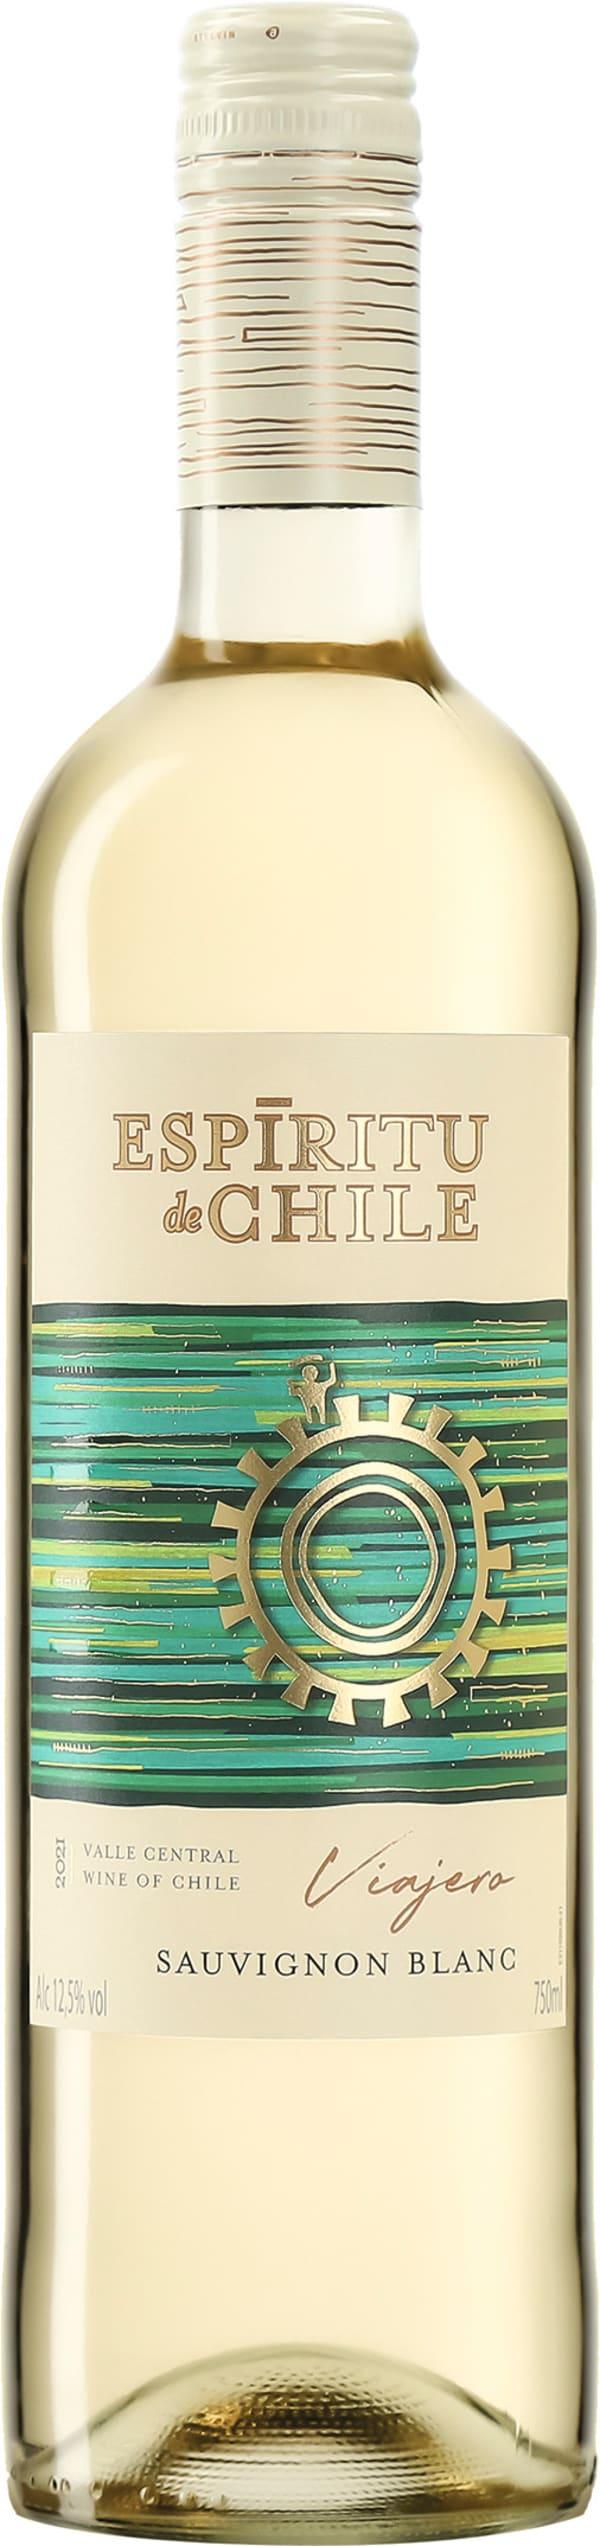 Espíritu de Chile Sauvignon Blanc 2015